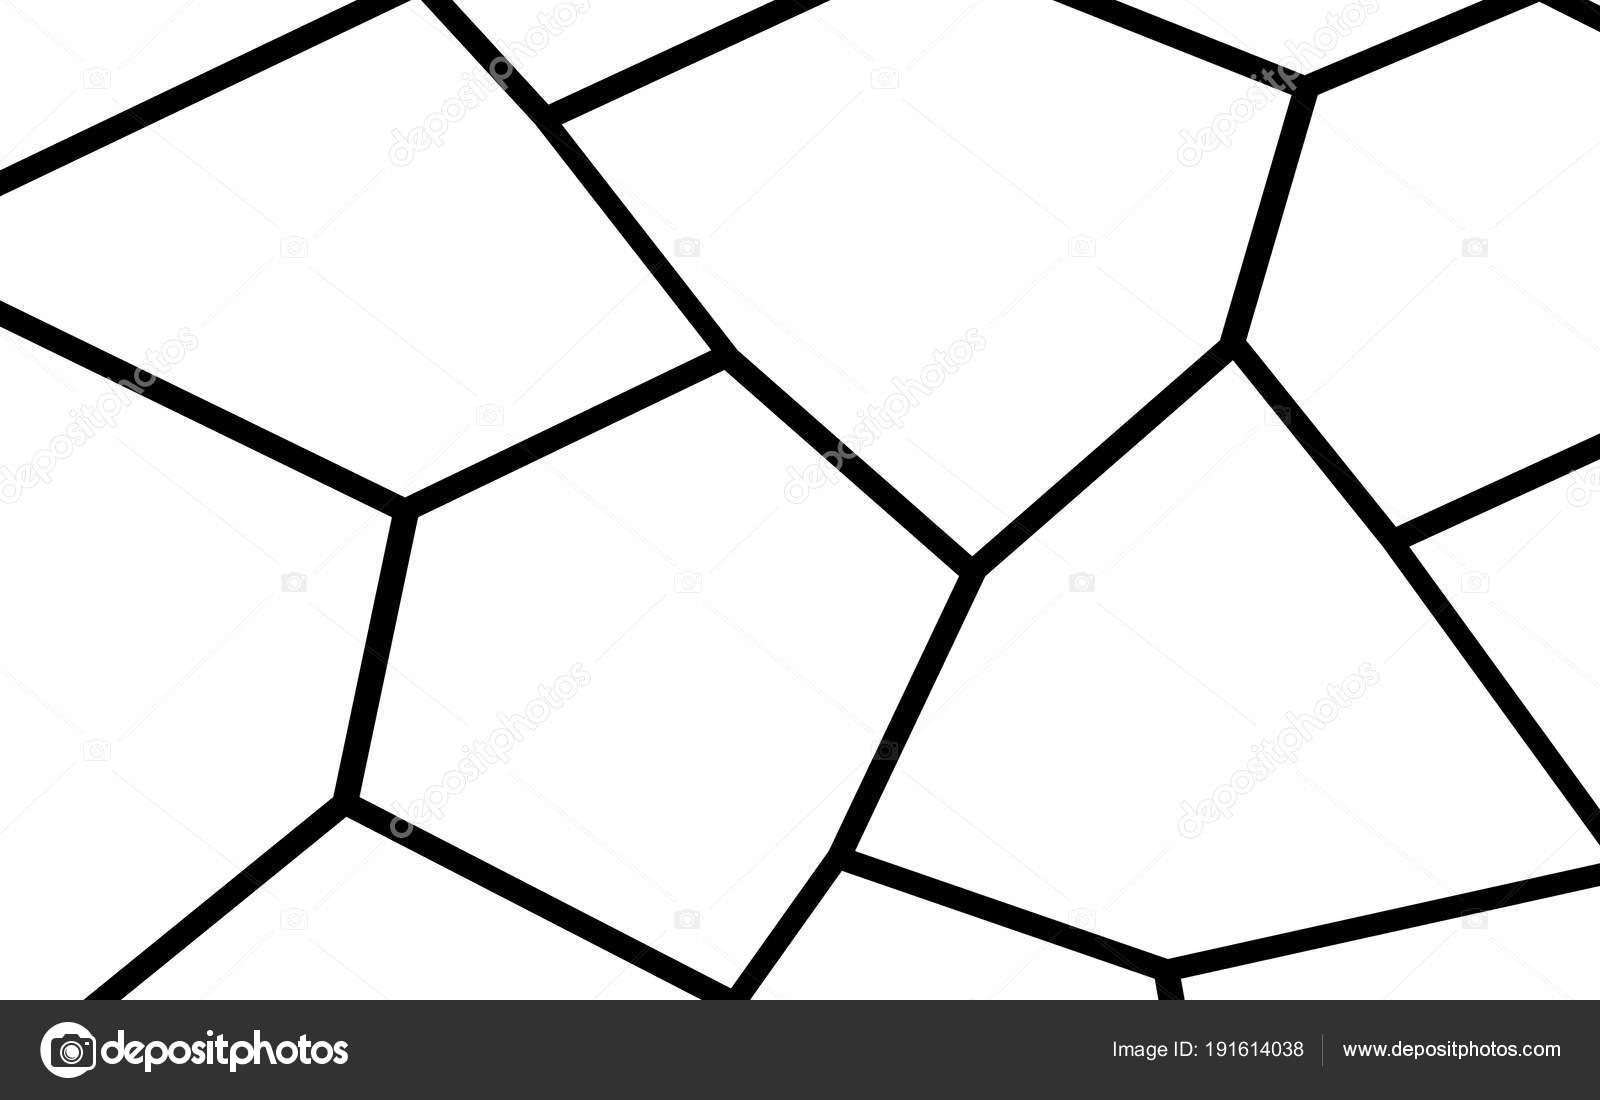 black and white irregular mosaic template stock vector